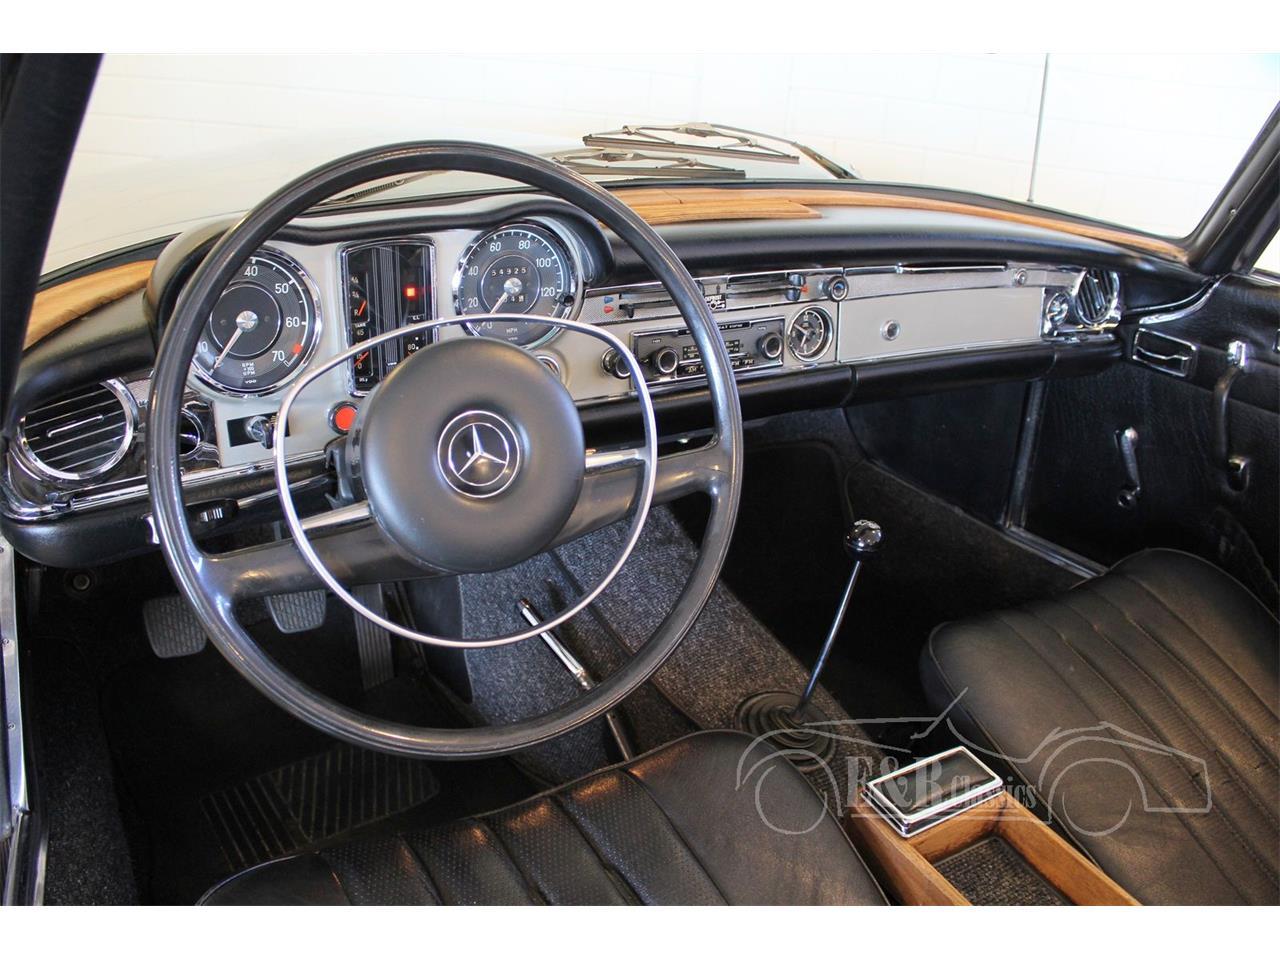 Large Picture of Classic '69 Mercedes-Benz 280SL - $104,800.00 - MU5M